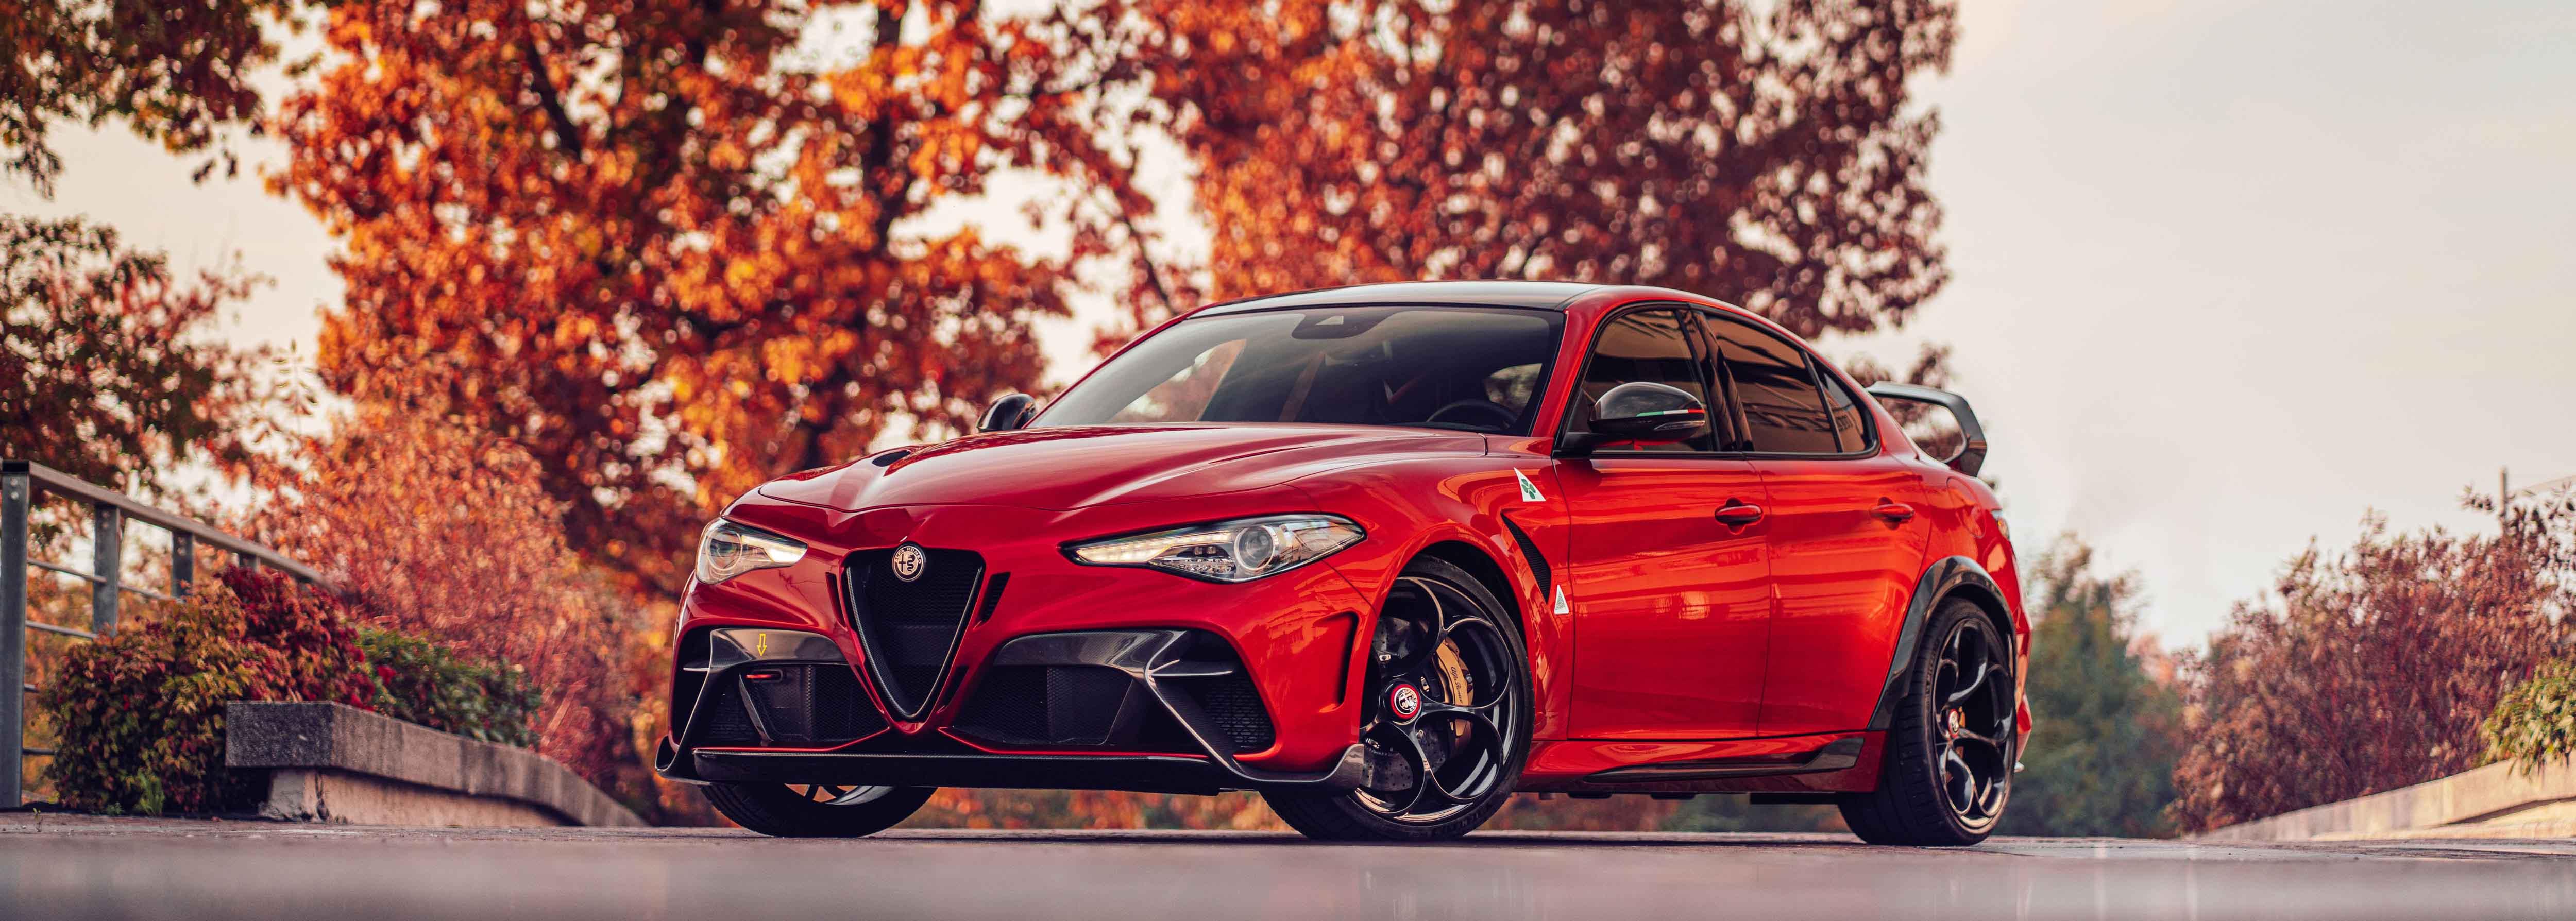 Alfa Romeo launches modern Giulia GTA